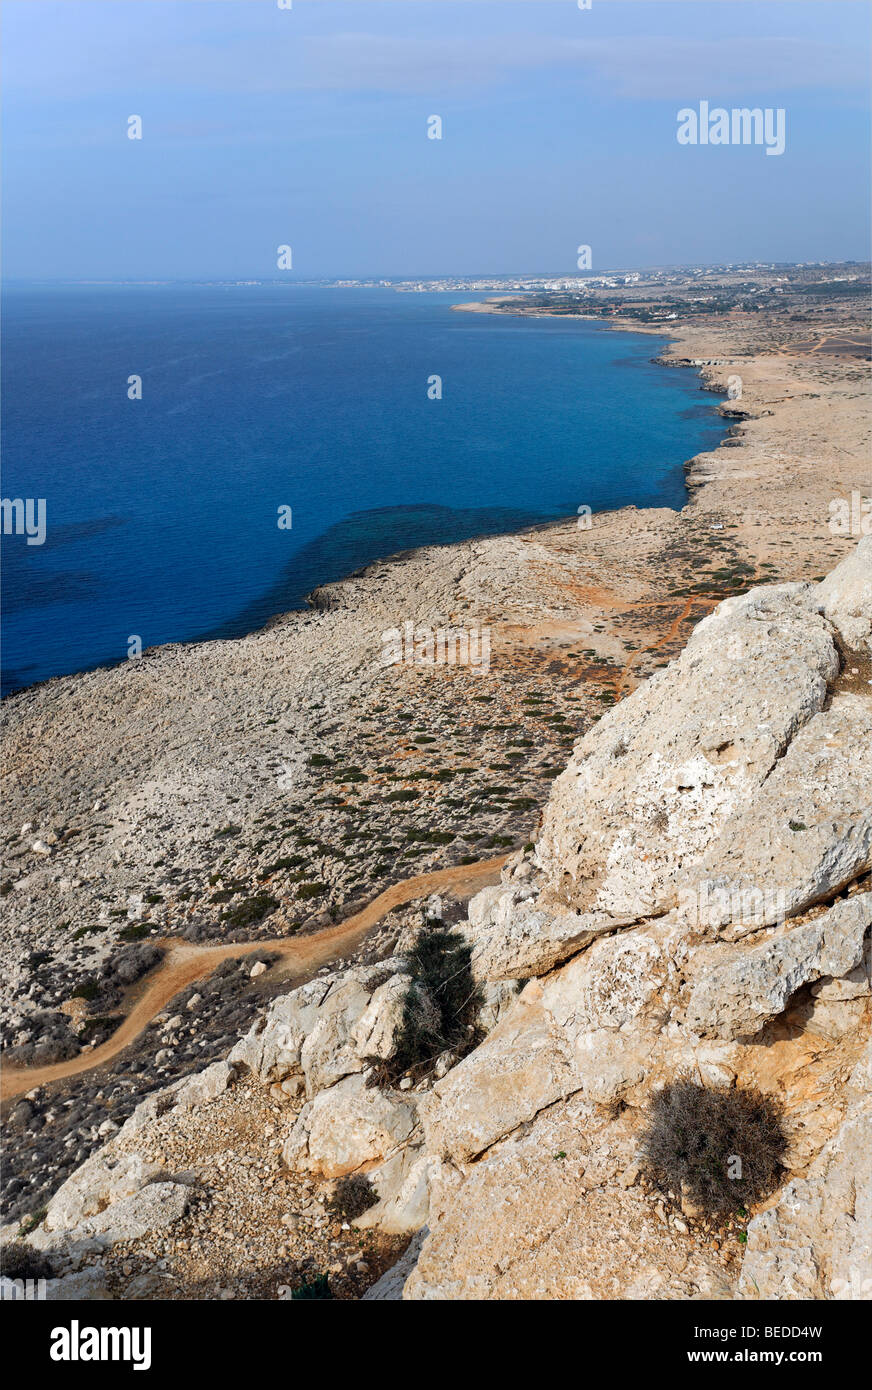 Cape Gkreko Halbinsel, Blick von Agia Napa, Larnaca, Zypern, Mittelmeer, Asien Stockbild